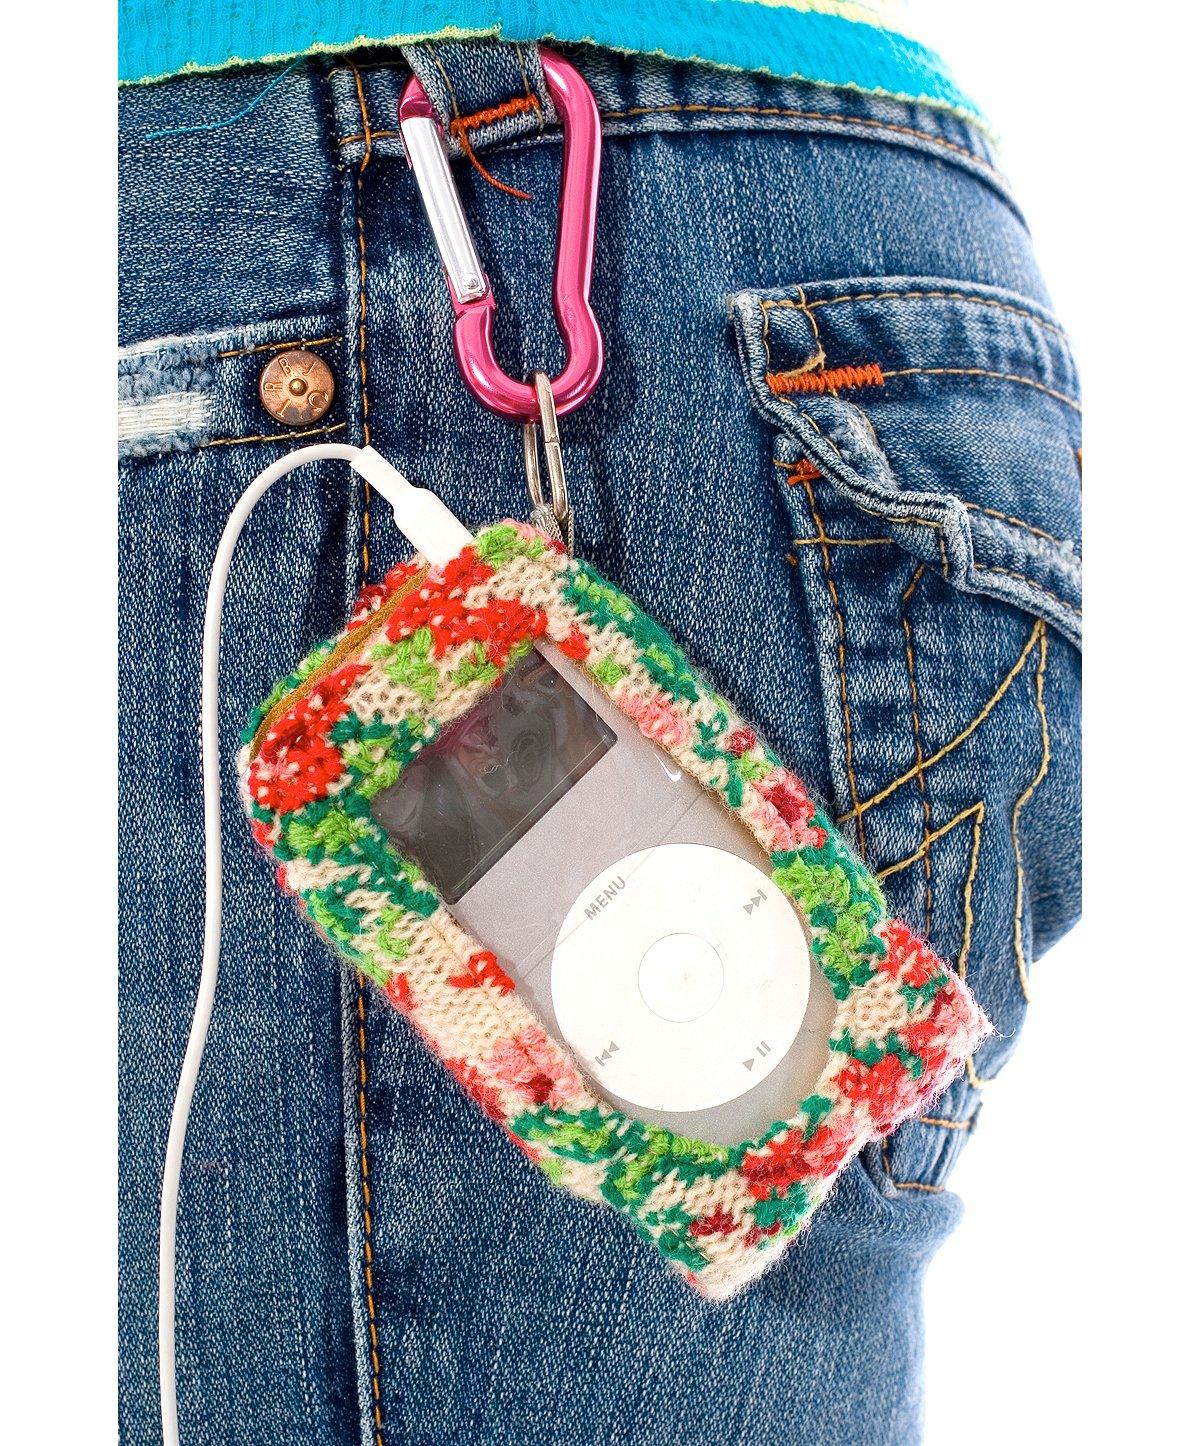 Embroidered Roses Mini Ipod Holder